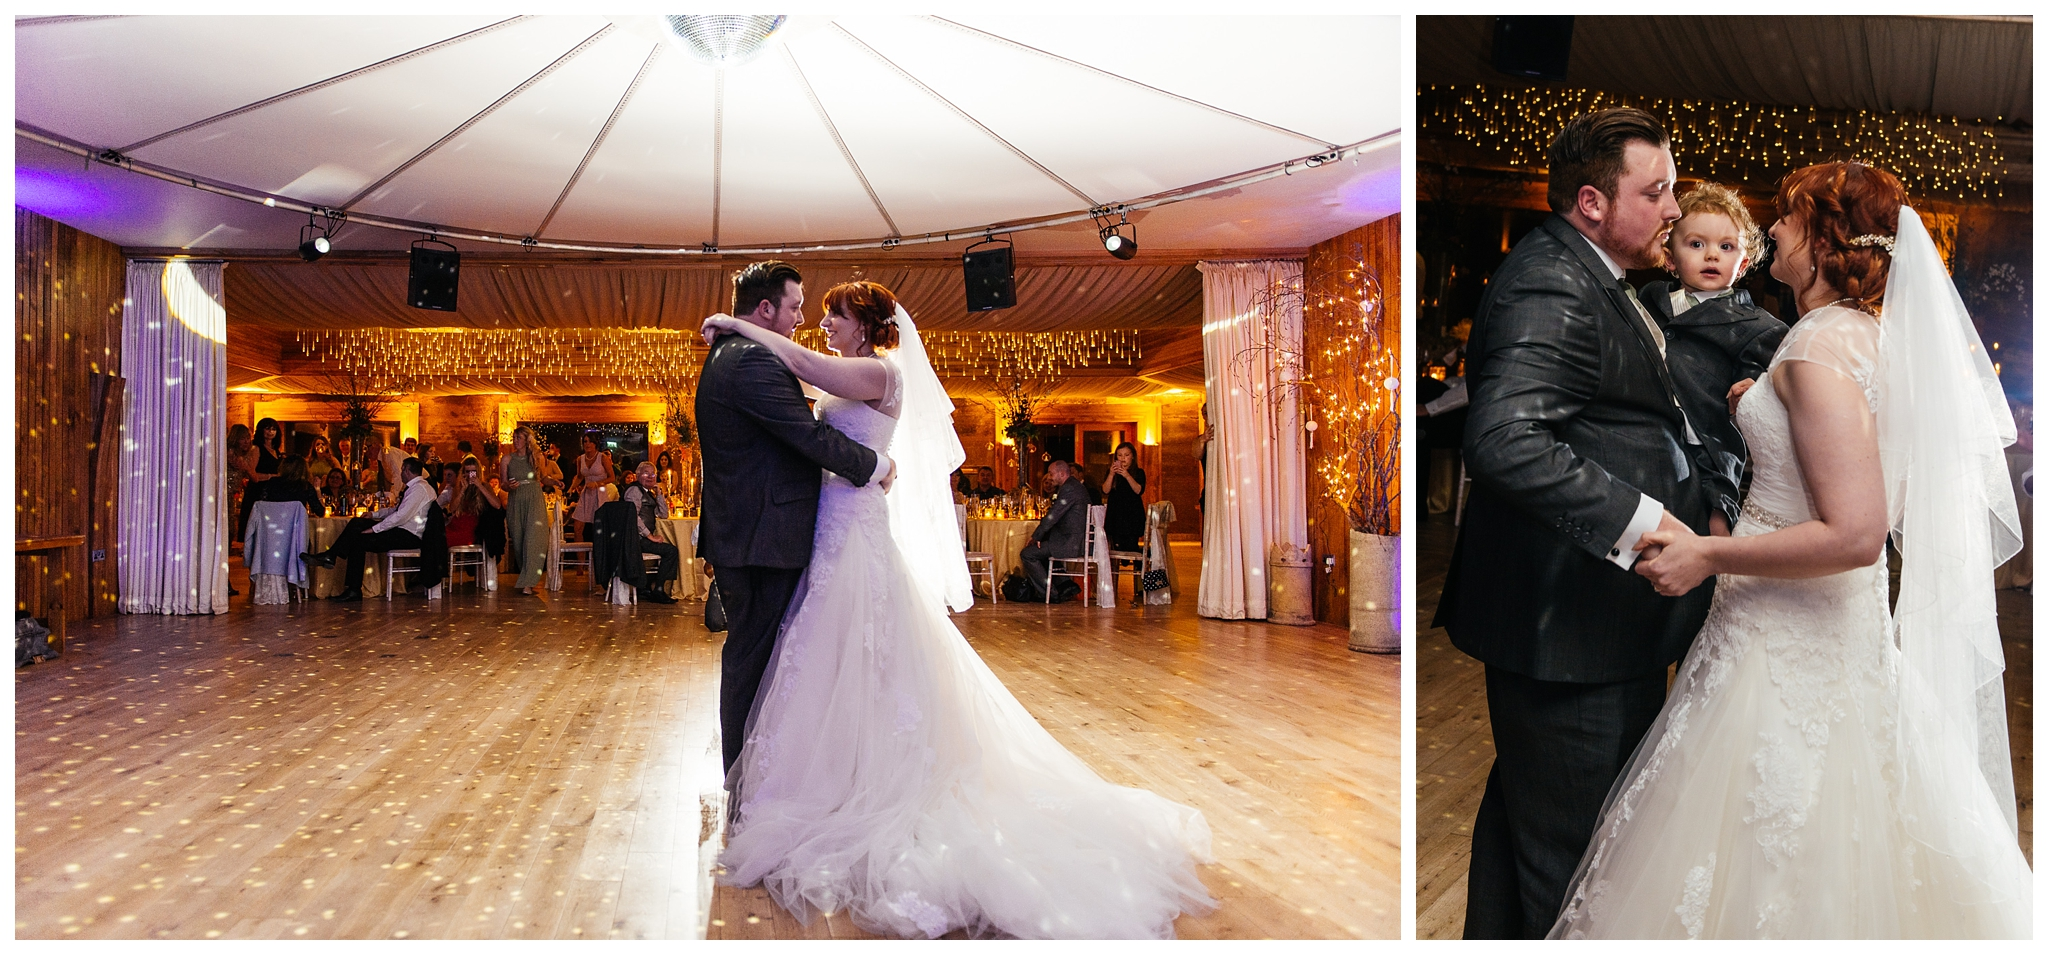 Emma&Paul-Elmore-Court-Winter-Wedding-Nikki-Cooper-Photography_0098.jpg